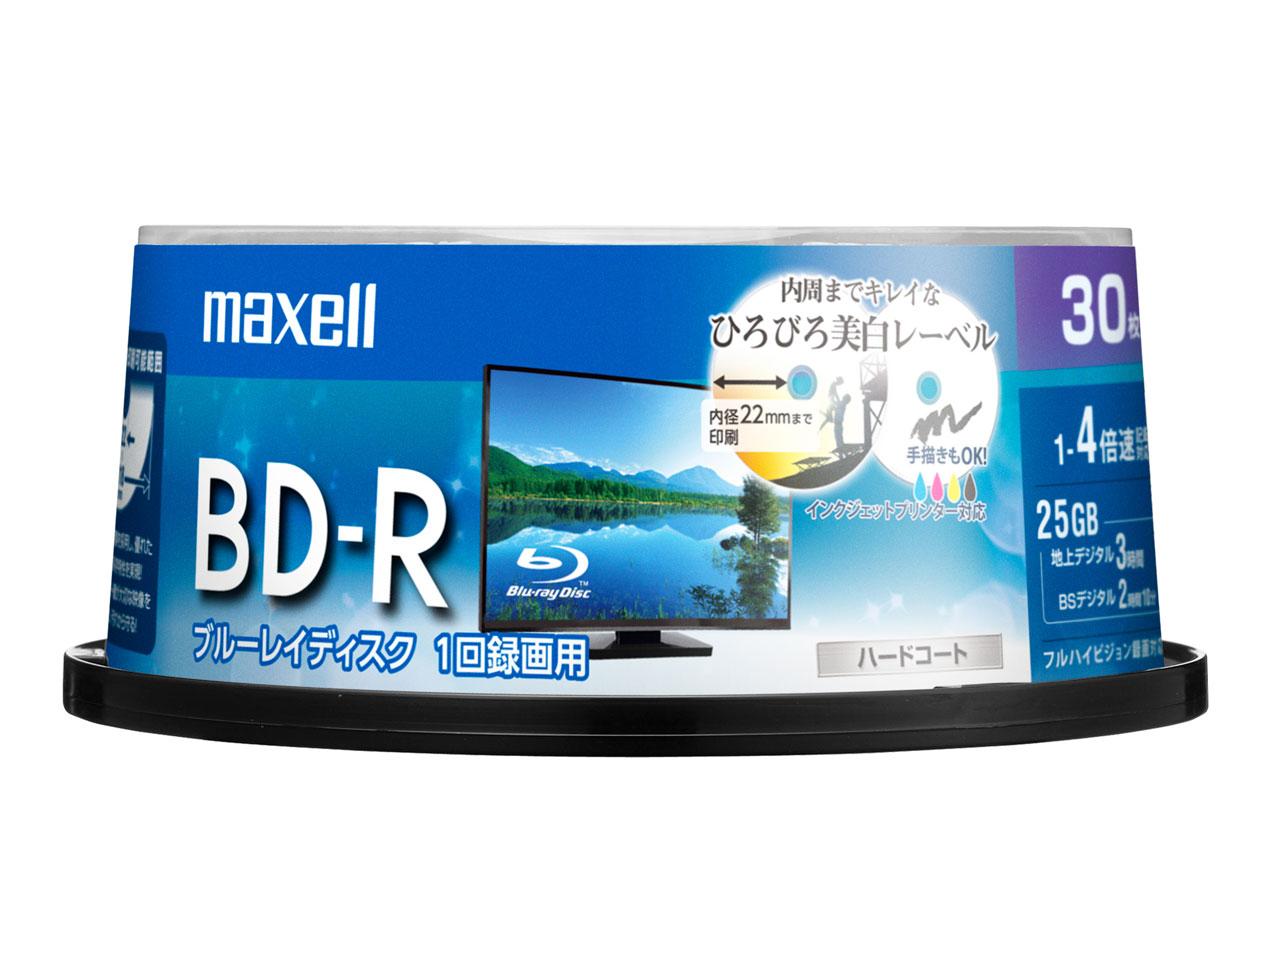 BRV25WPE.30SP [BD-R 4倍速 30枚組] の製品画像